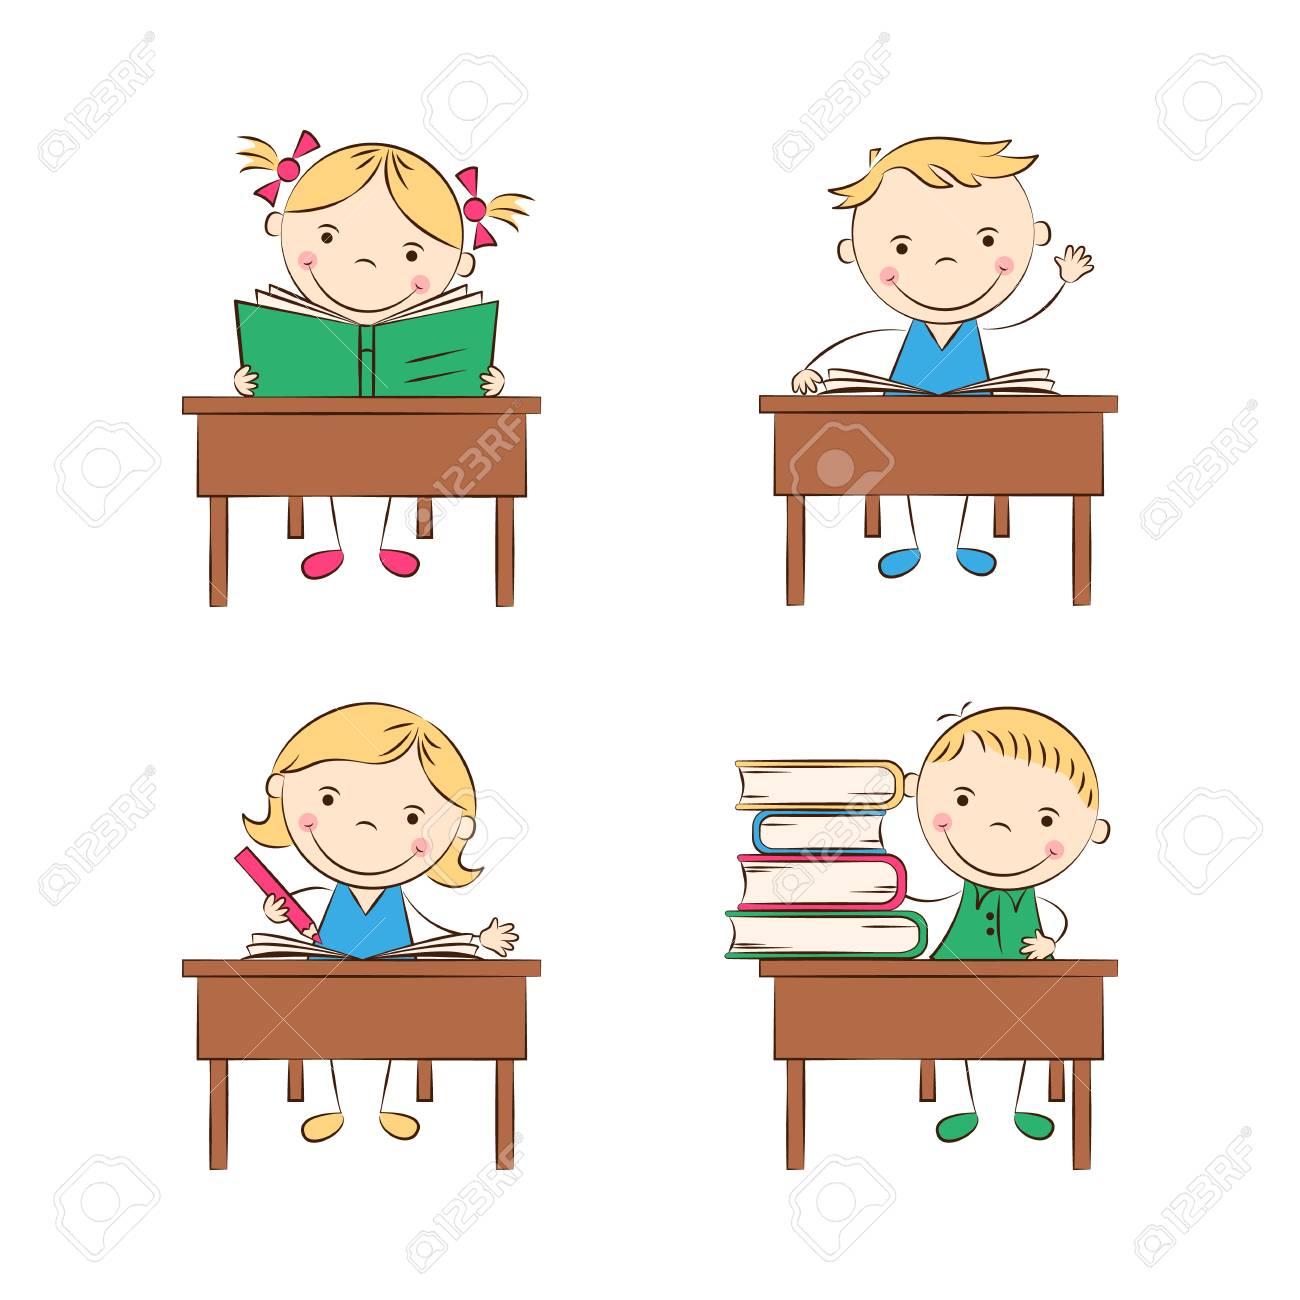 Funny Cartoon Images Of Boys funny doodle kids sit at school desks in classroom. happy cartoon..